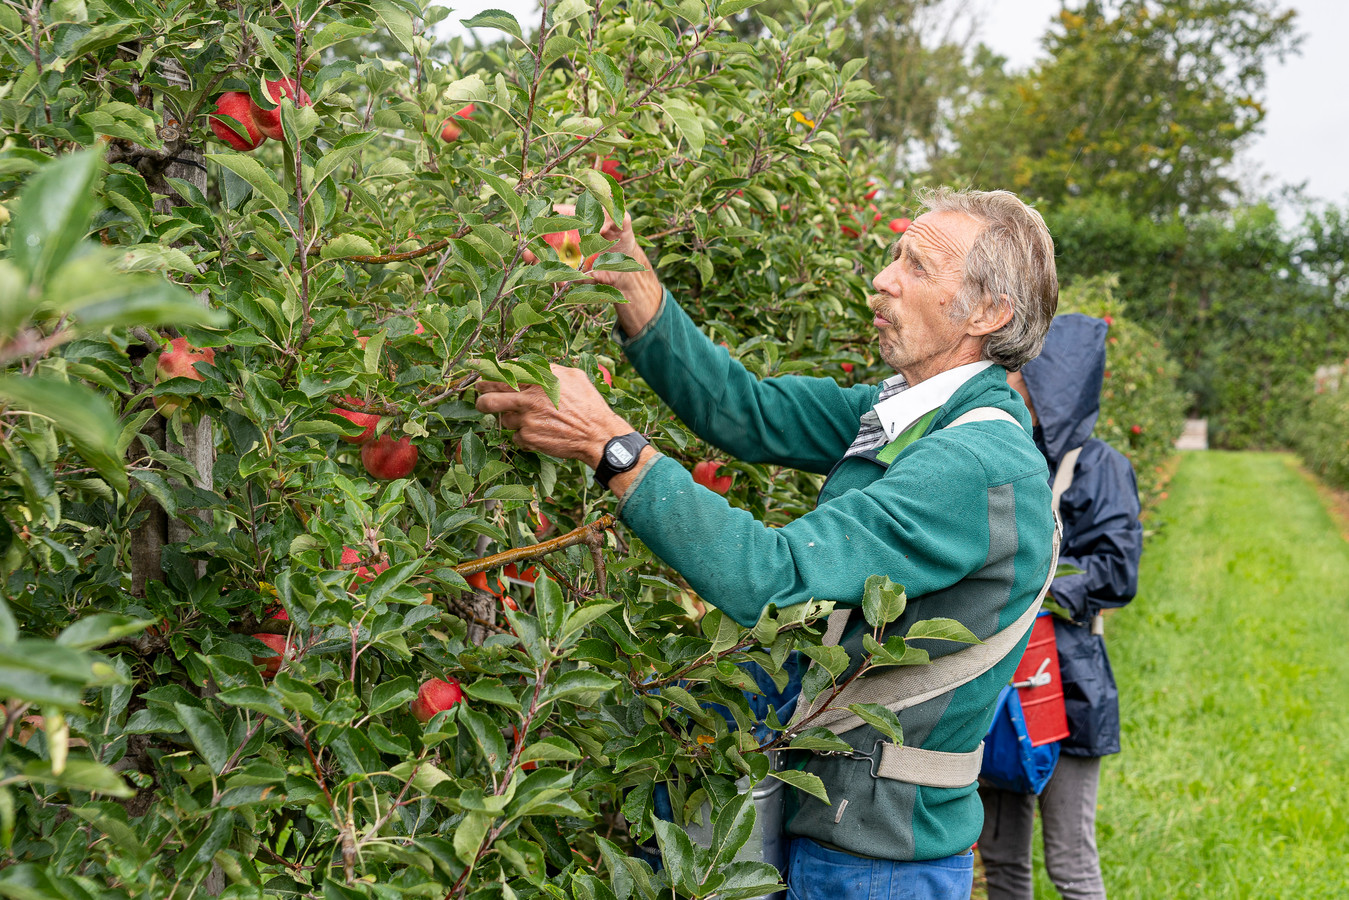 Ko Louws plukt appels van het oude Discovery.